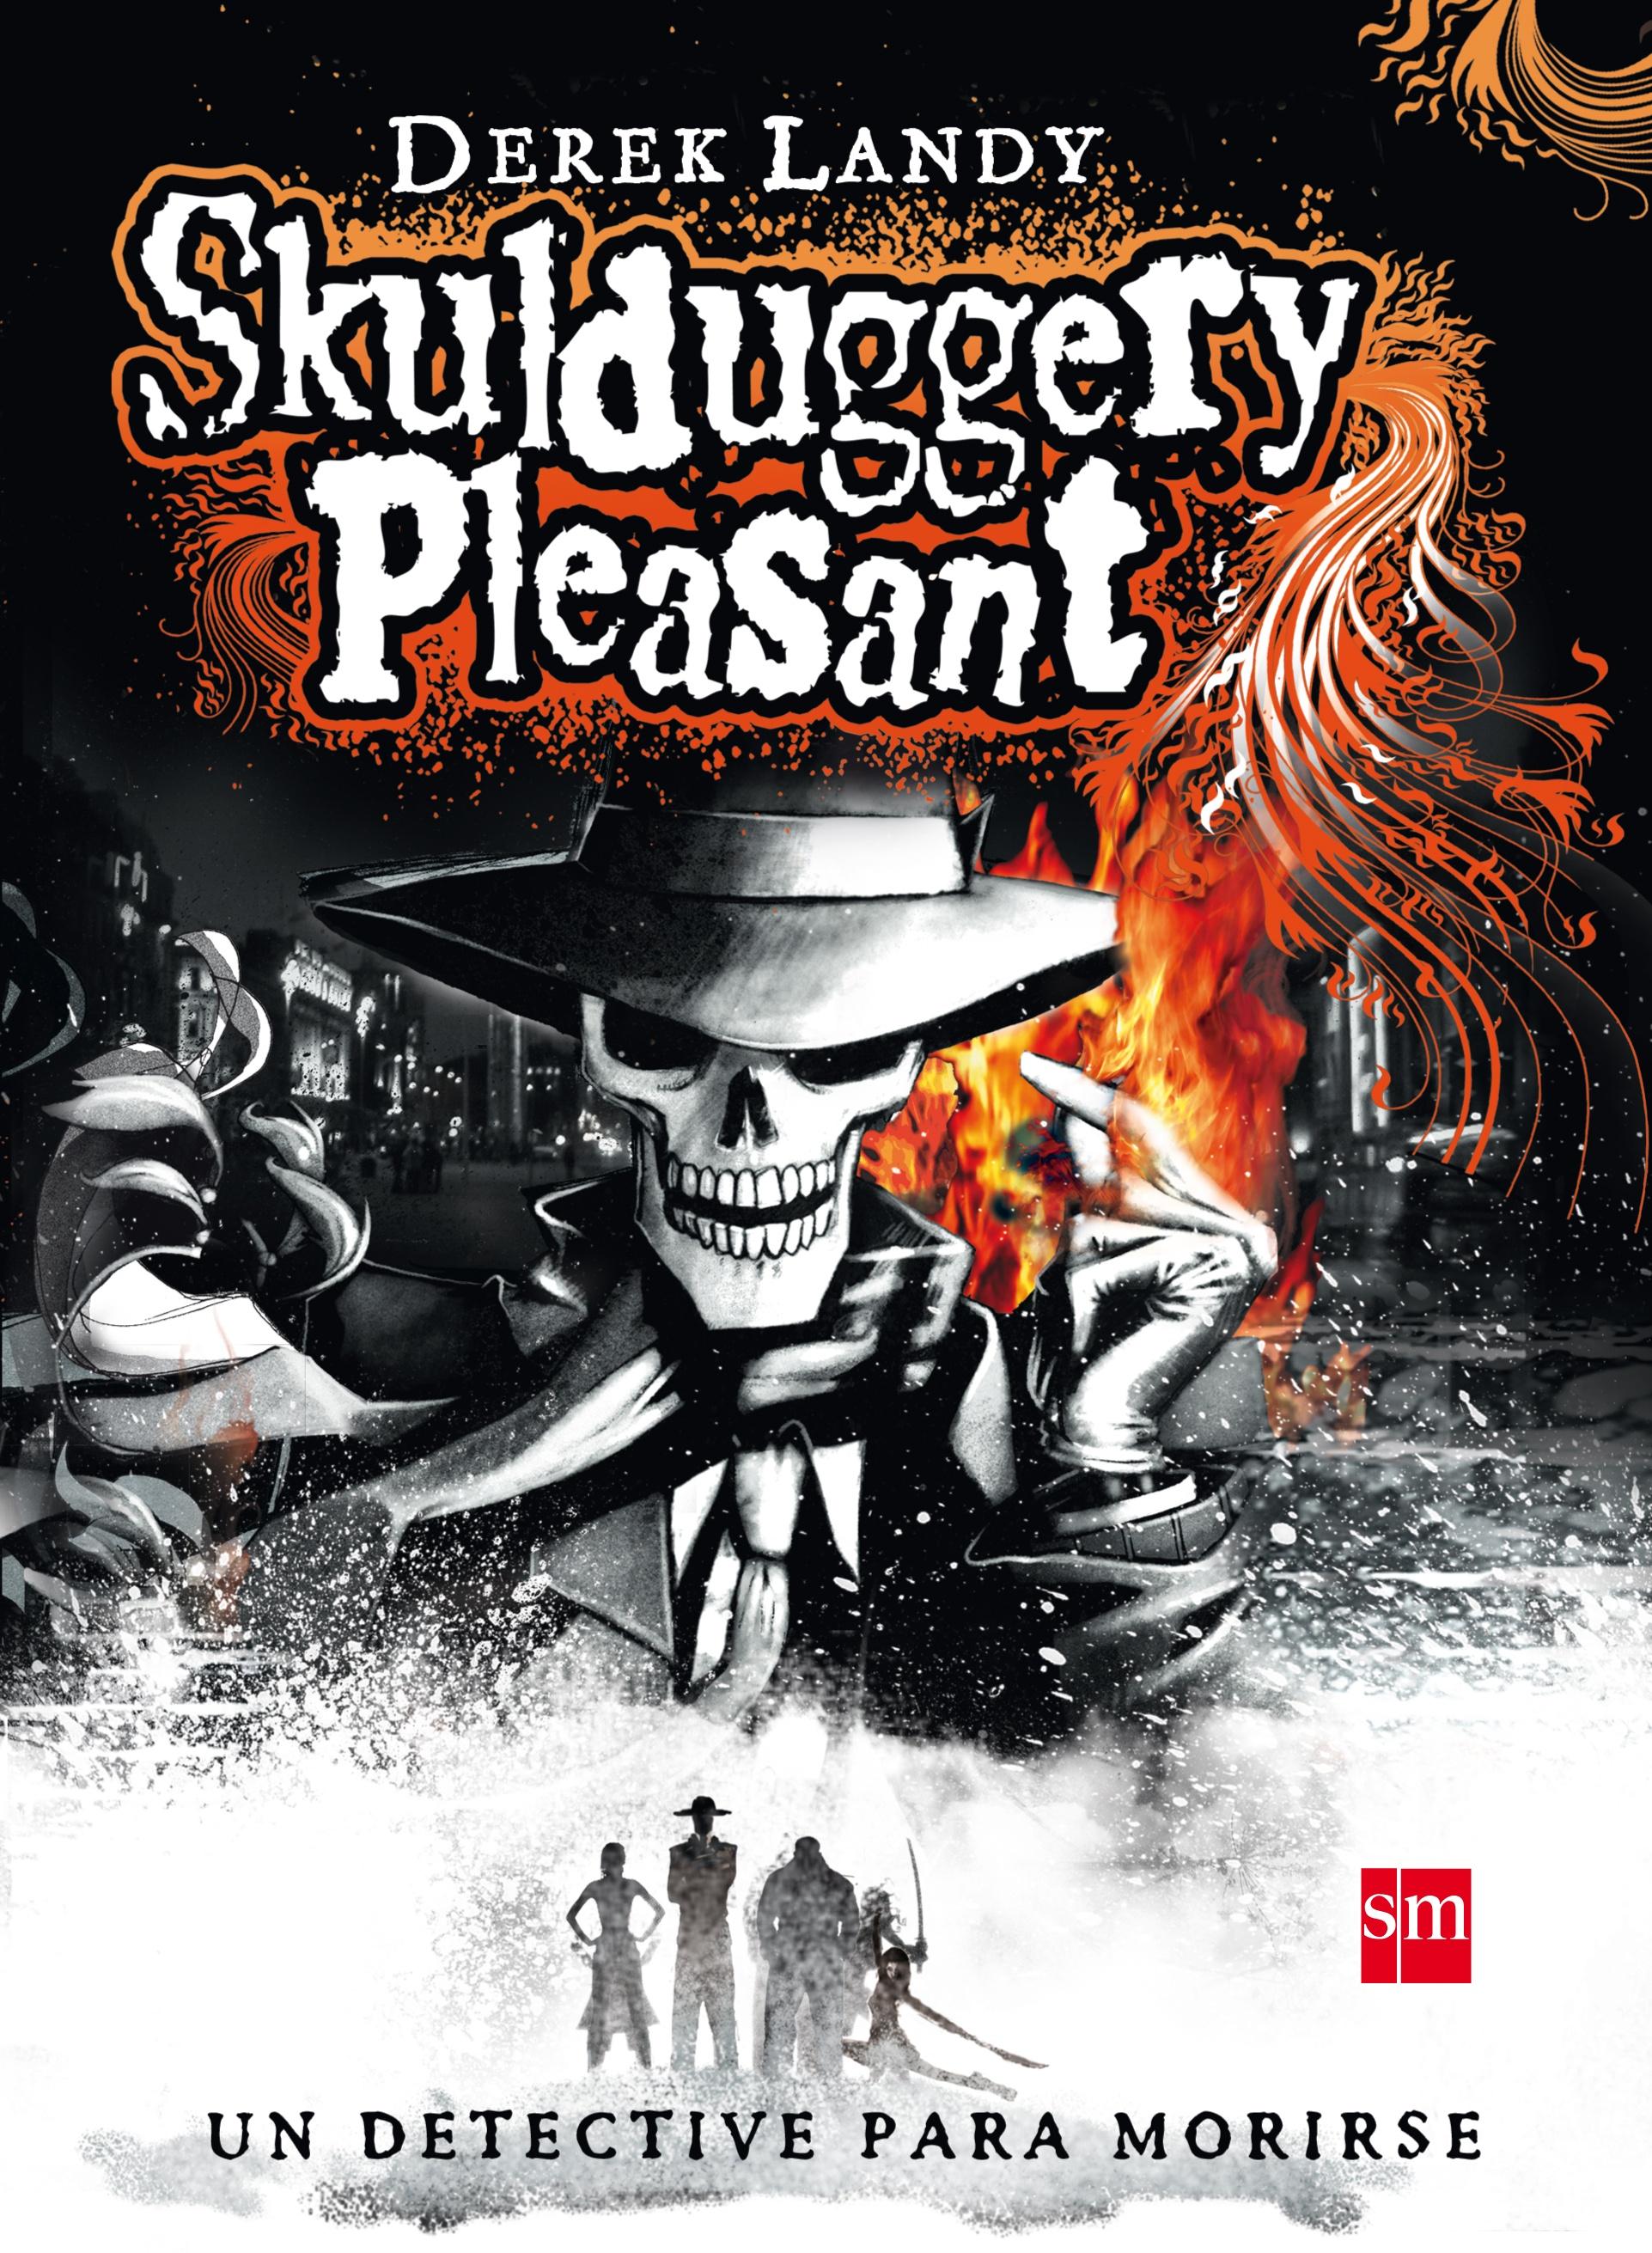 Detective Esqueleto [Skulduggery Pleasant]